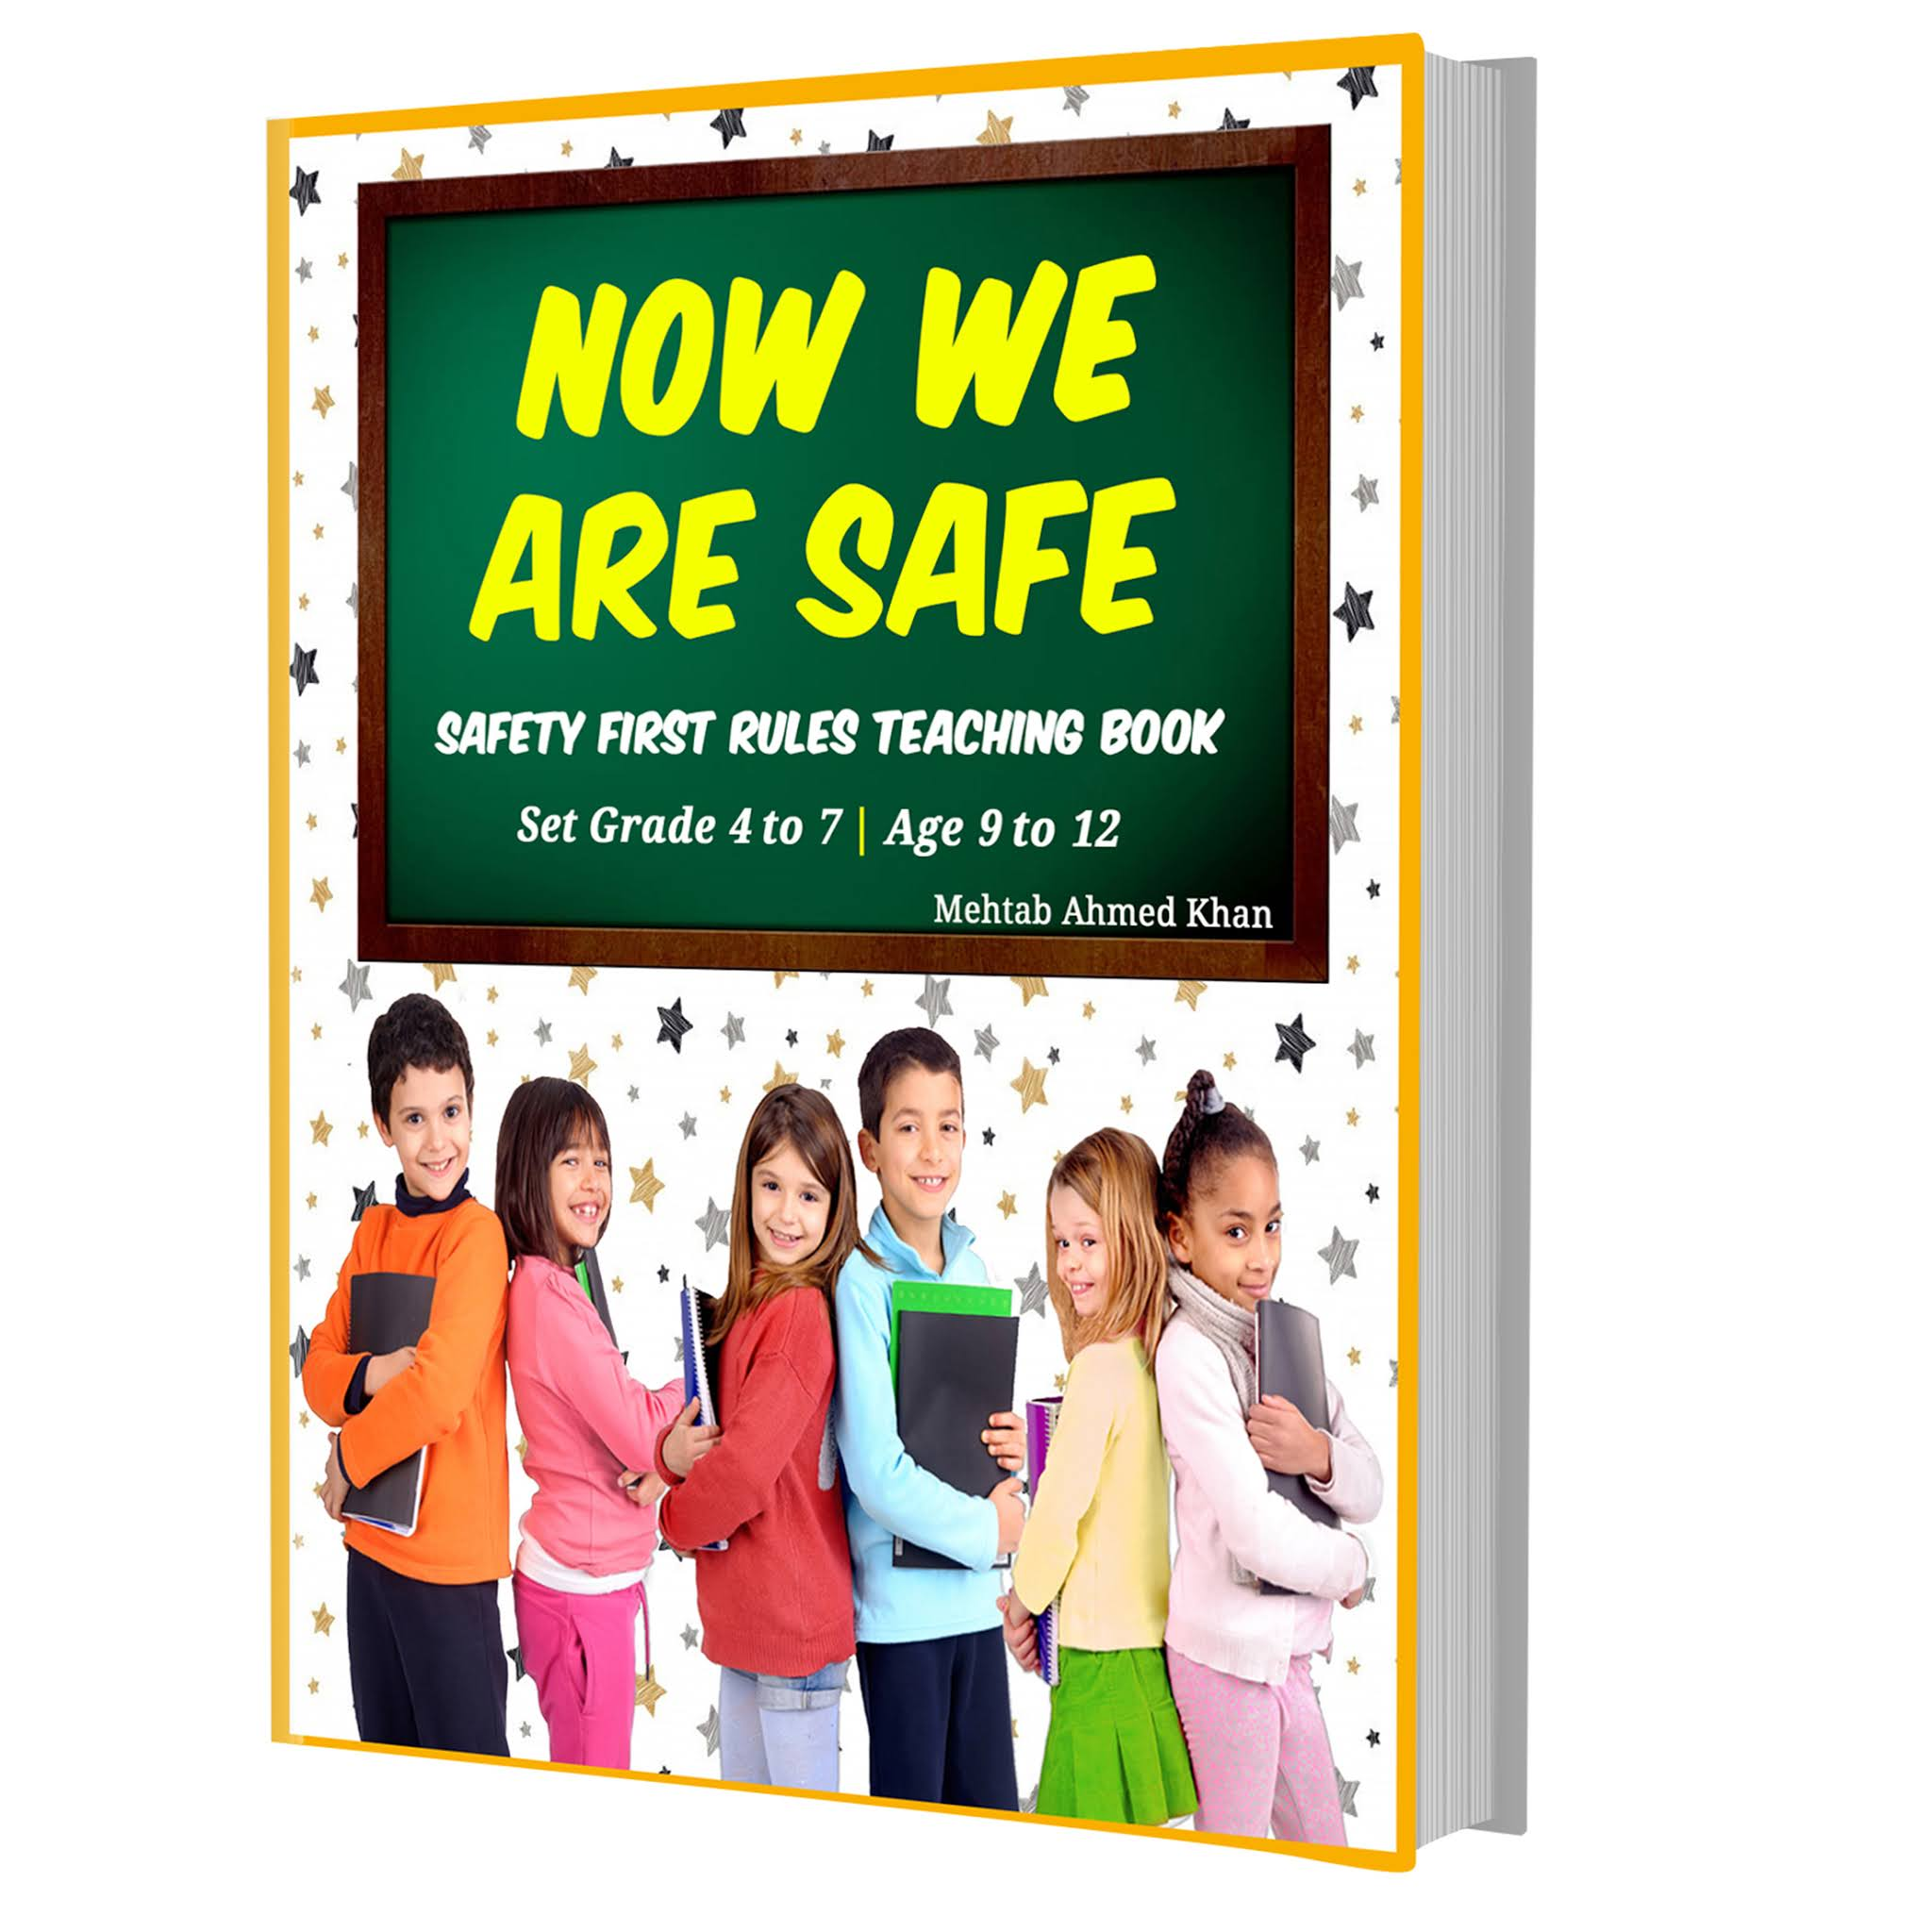 book for children - classic children's books - books for 5th graders - kids books online - kids books